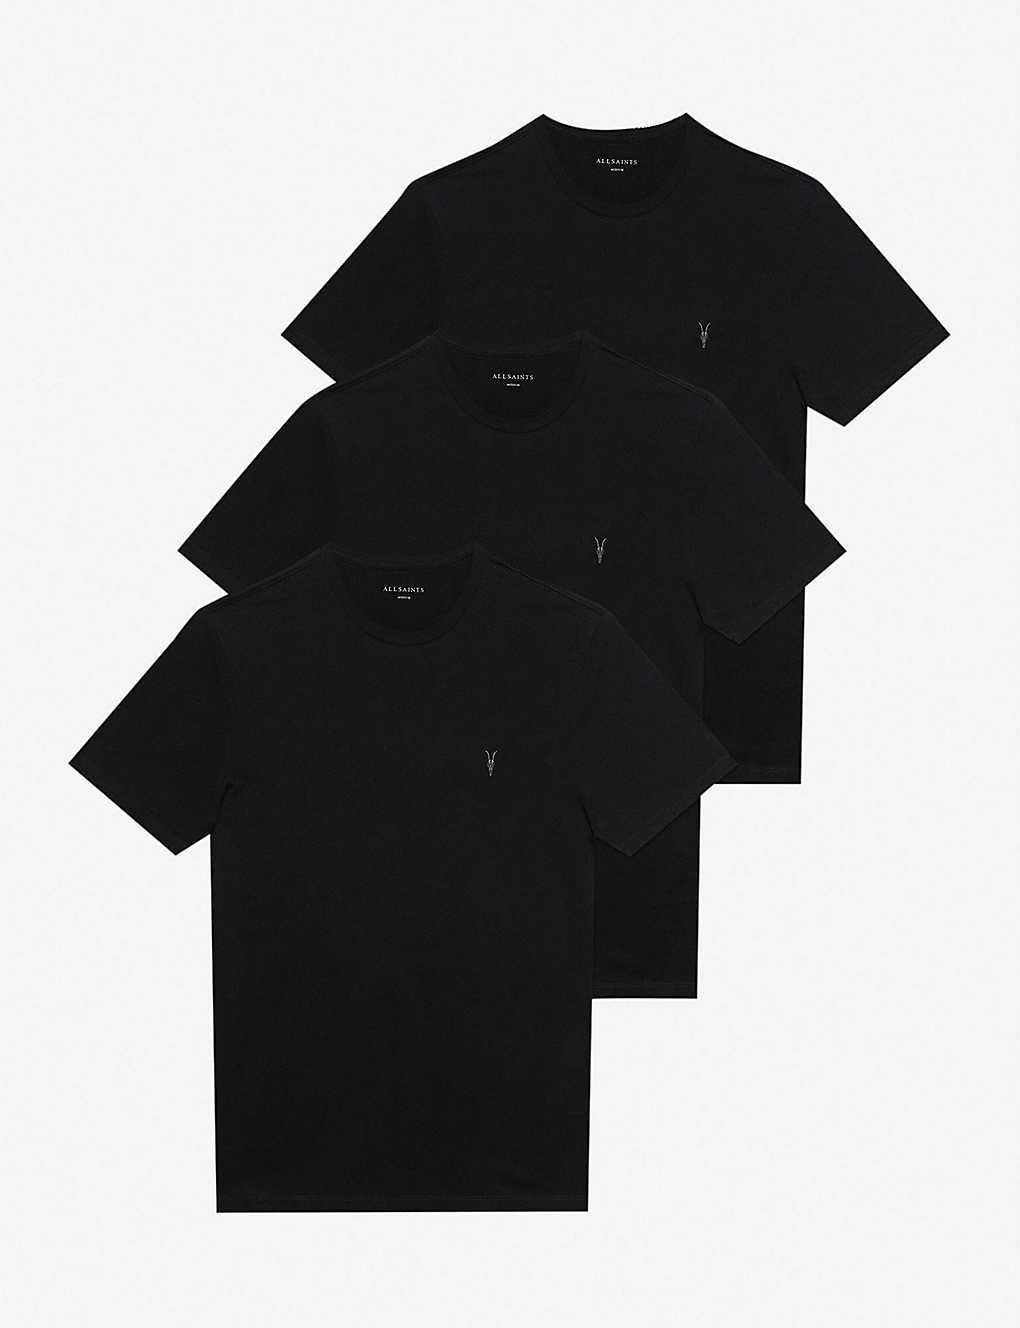 7c4159976a6cae ALLSAINTS - Brace tonic pack of three cotton-jersey T-shirts |  Selfridges.com